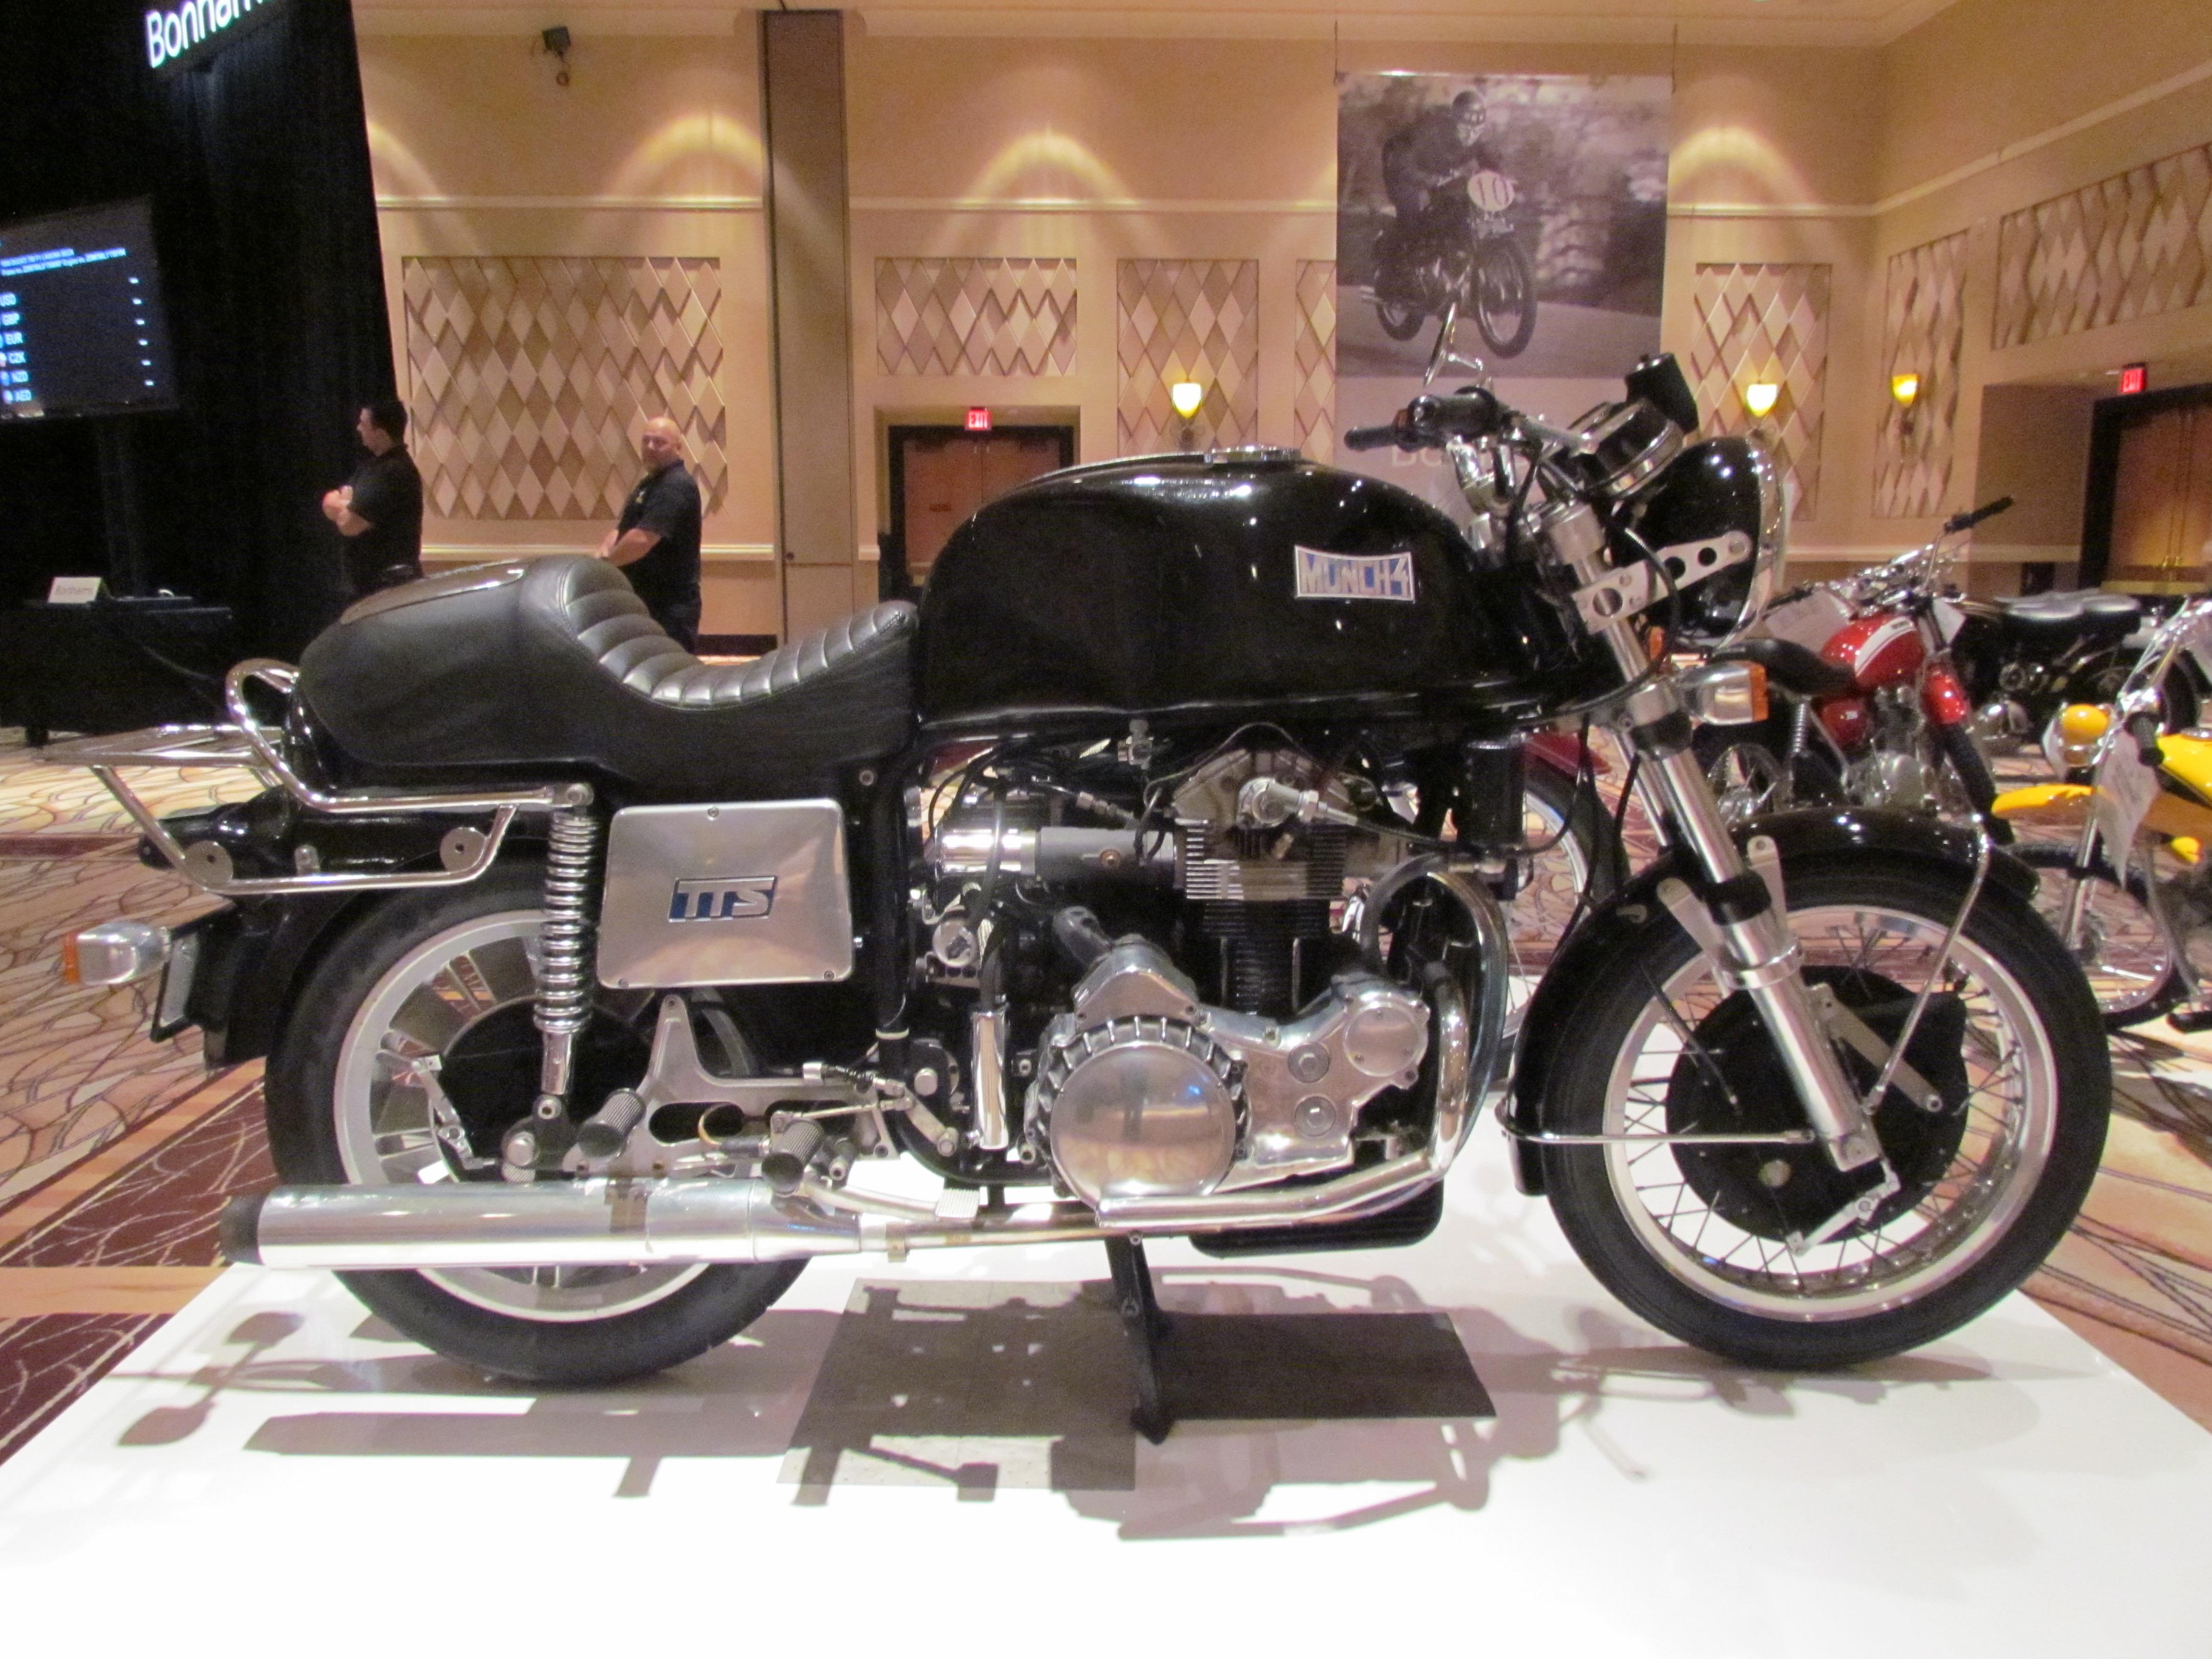 McQueen, McQueen magic strikes again at Bonhams' Las Vegas motorcycle auction, ClassicCars.com Journal